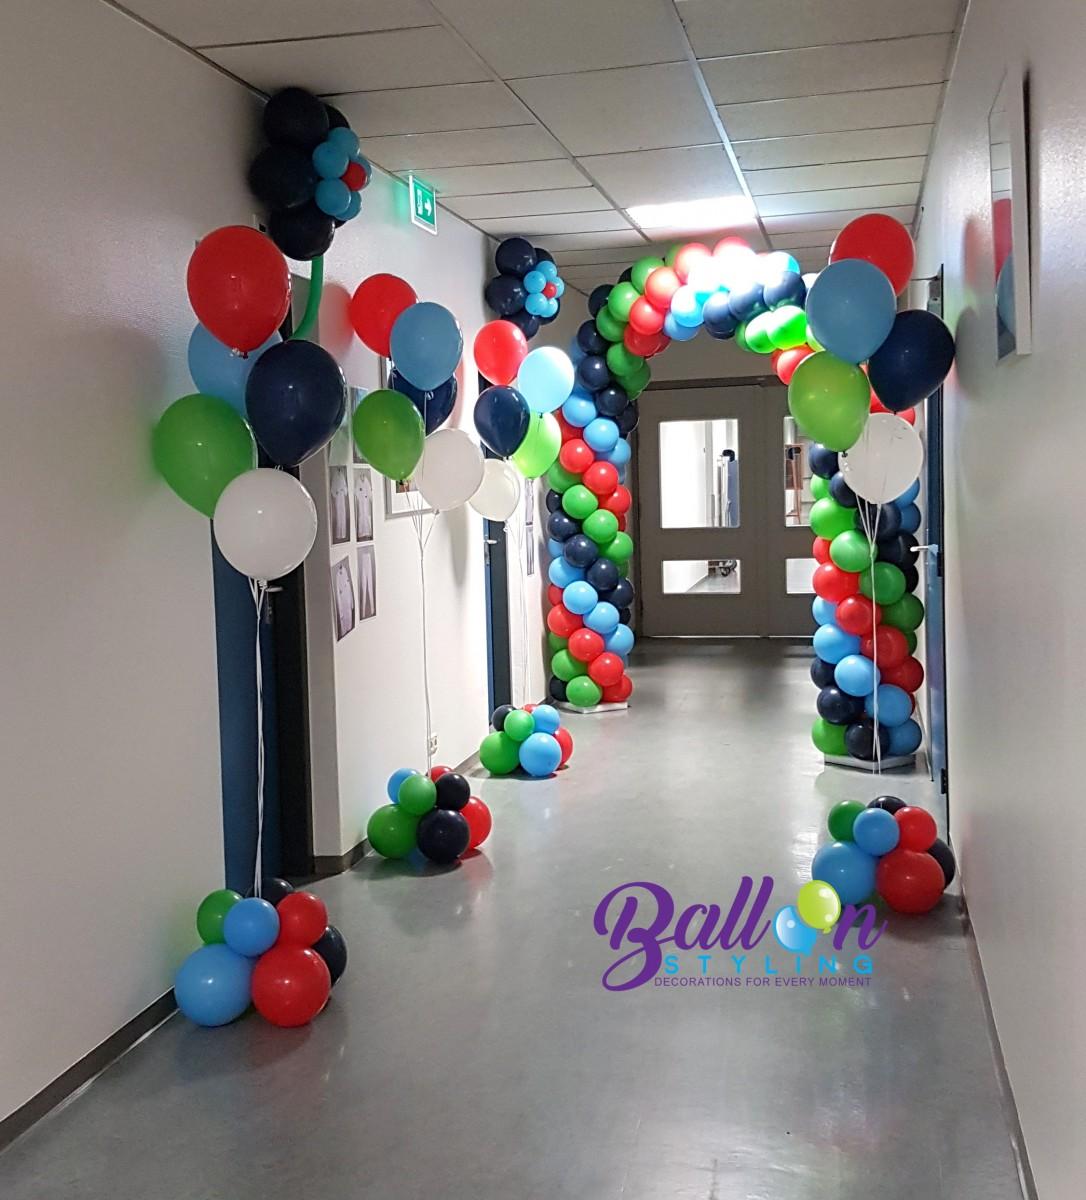 Balloon-Styling-ballonnenboog-ballonboog-gronddecoratie-vloerdecoratie-heliumballonnen-Tweesteden-ziekenhuis-Waalwijk ballonnen Tilburg